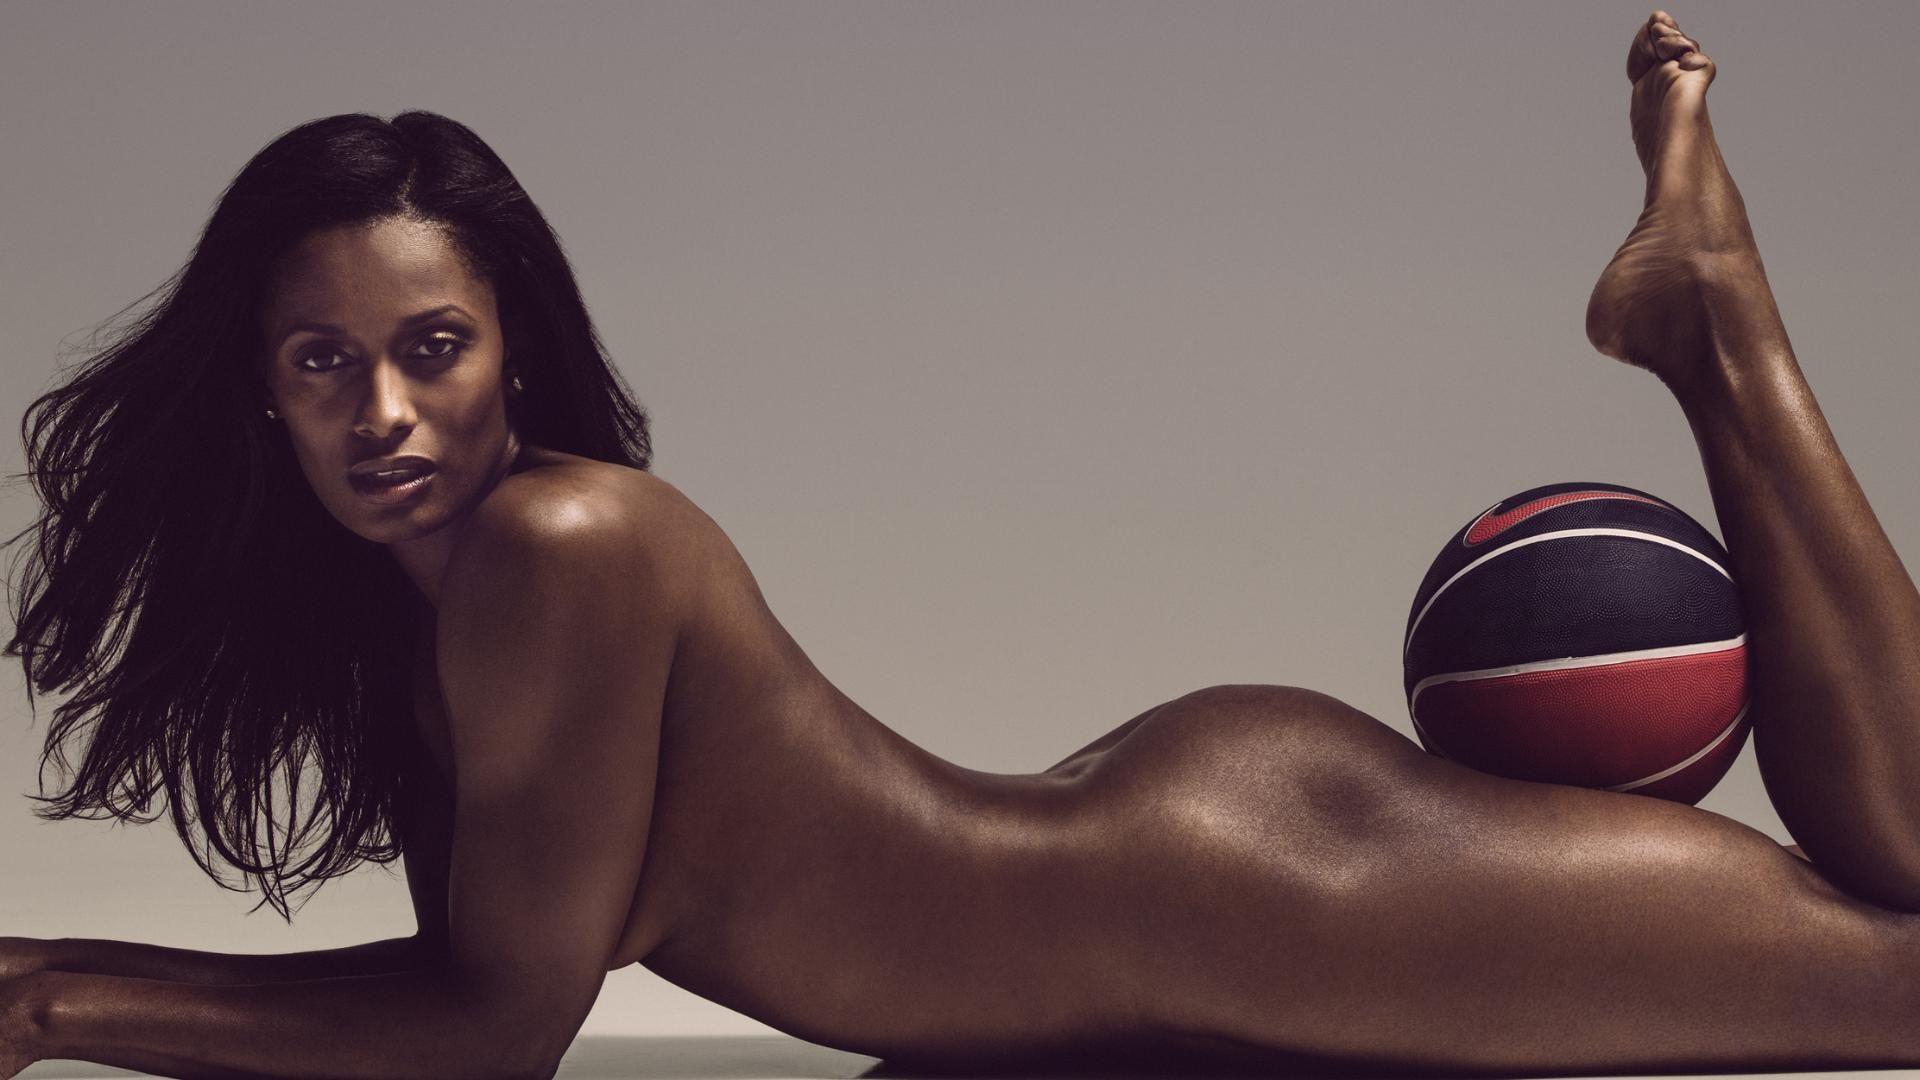 ESPN The Mag Body Issue 2013: Swin Cash